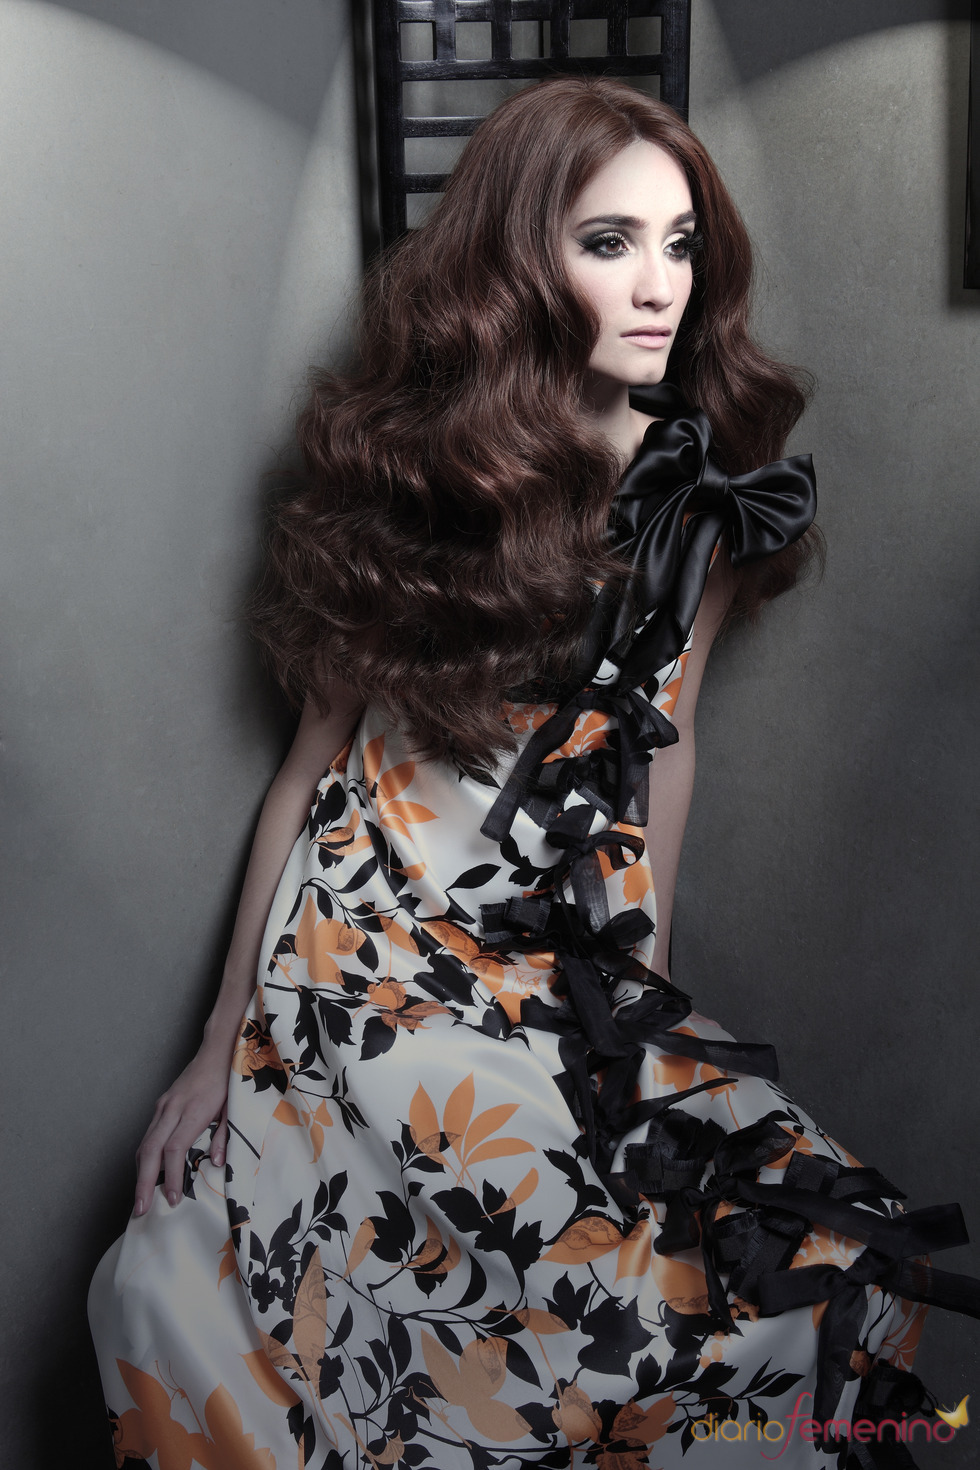 Vestido floreado de Eugenio Loarce